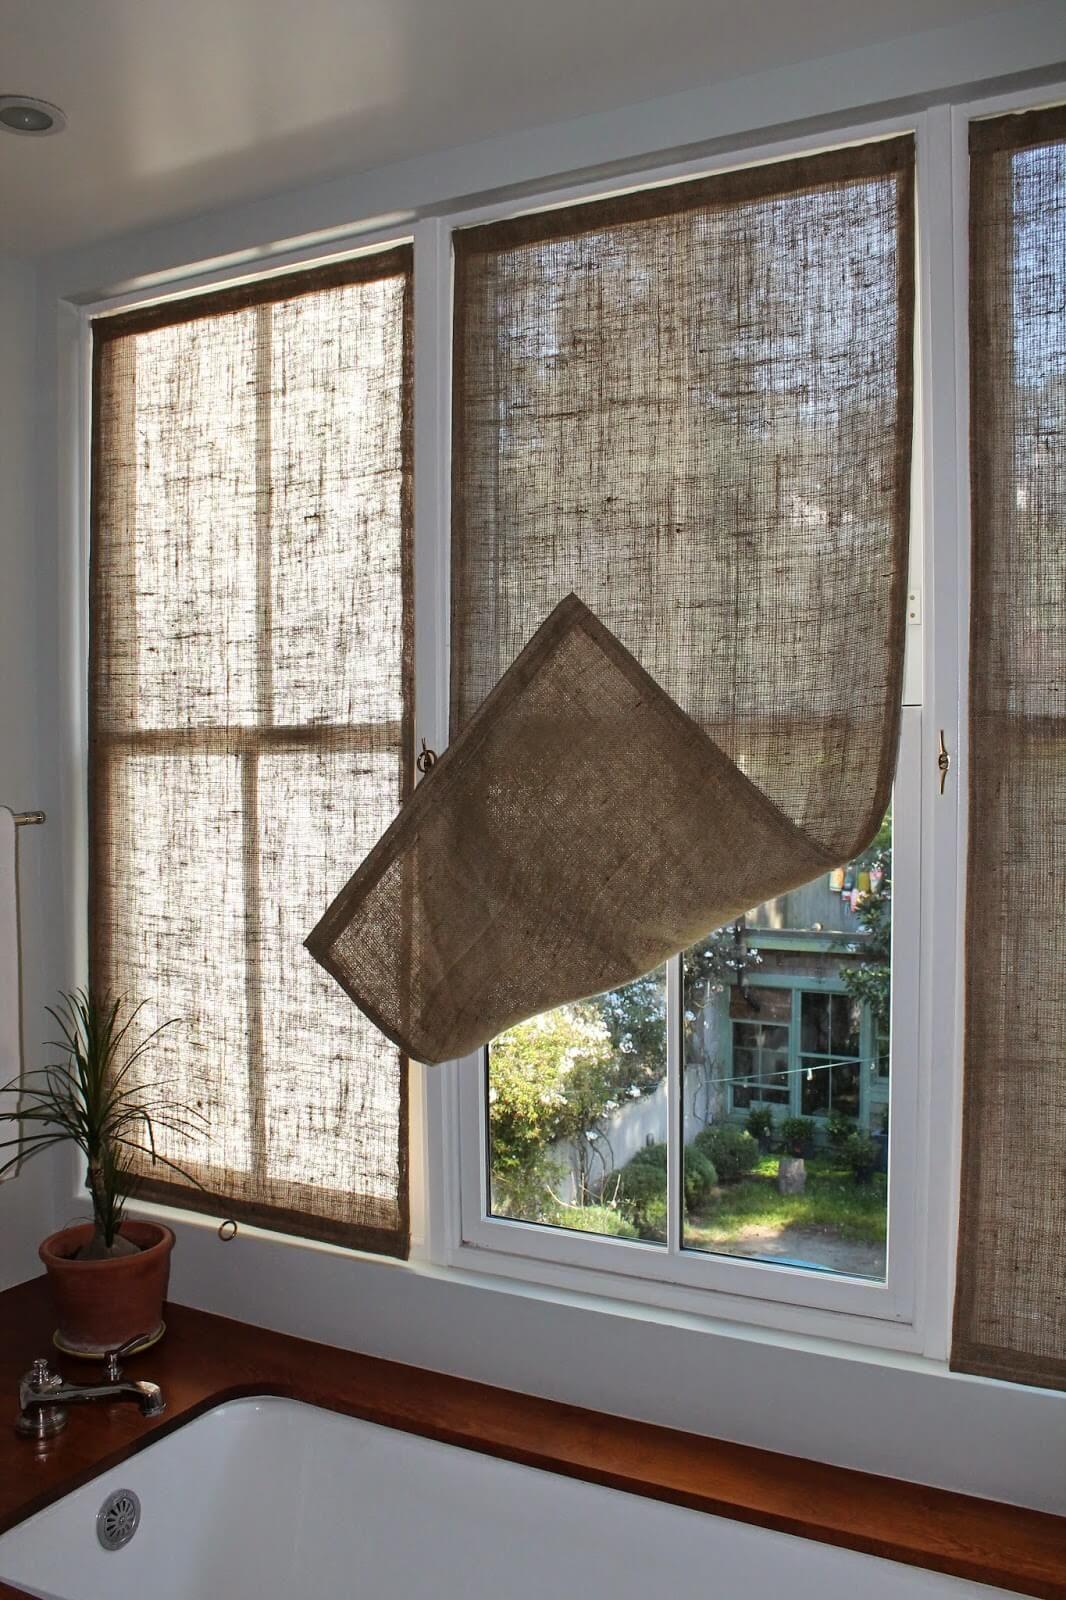 farmhouse window treatment ideas to bring oldfashioned charm to